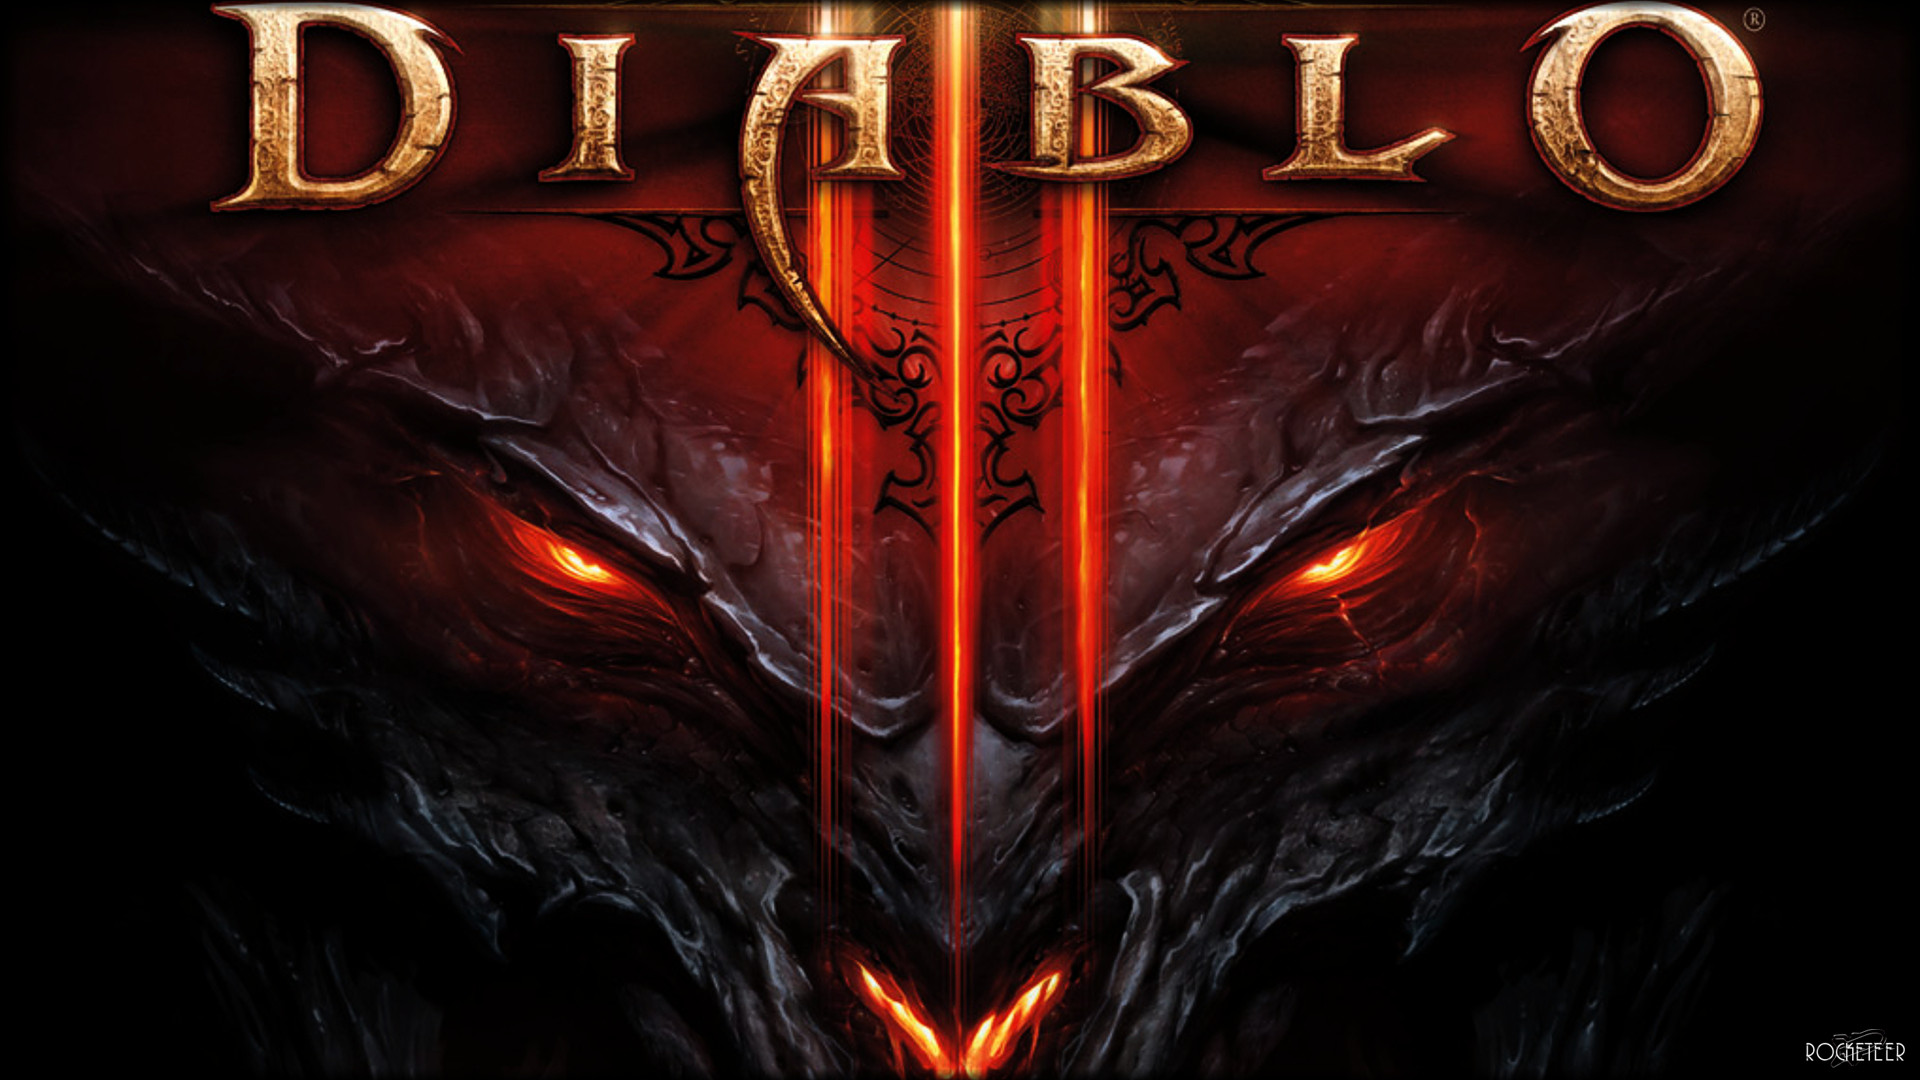 Hd Diablo 3 Wallpapers 80 Images